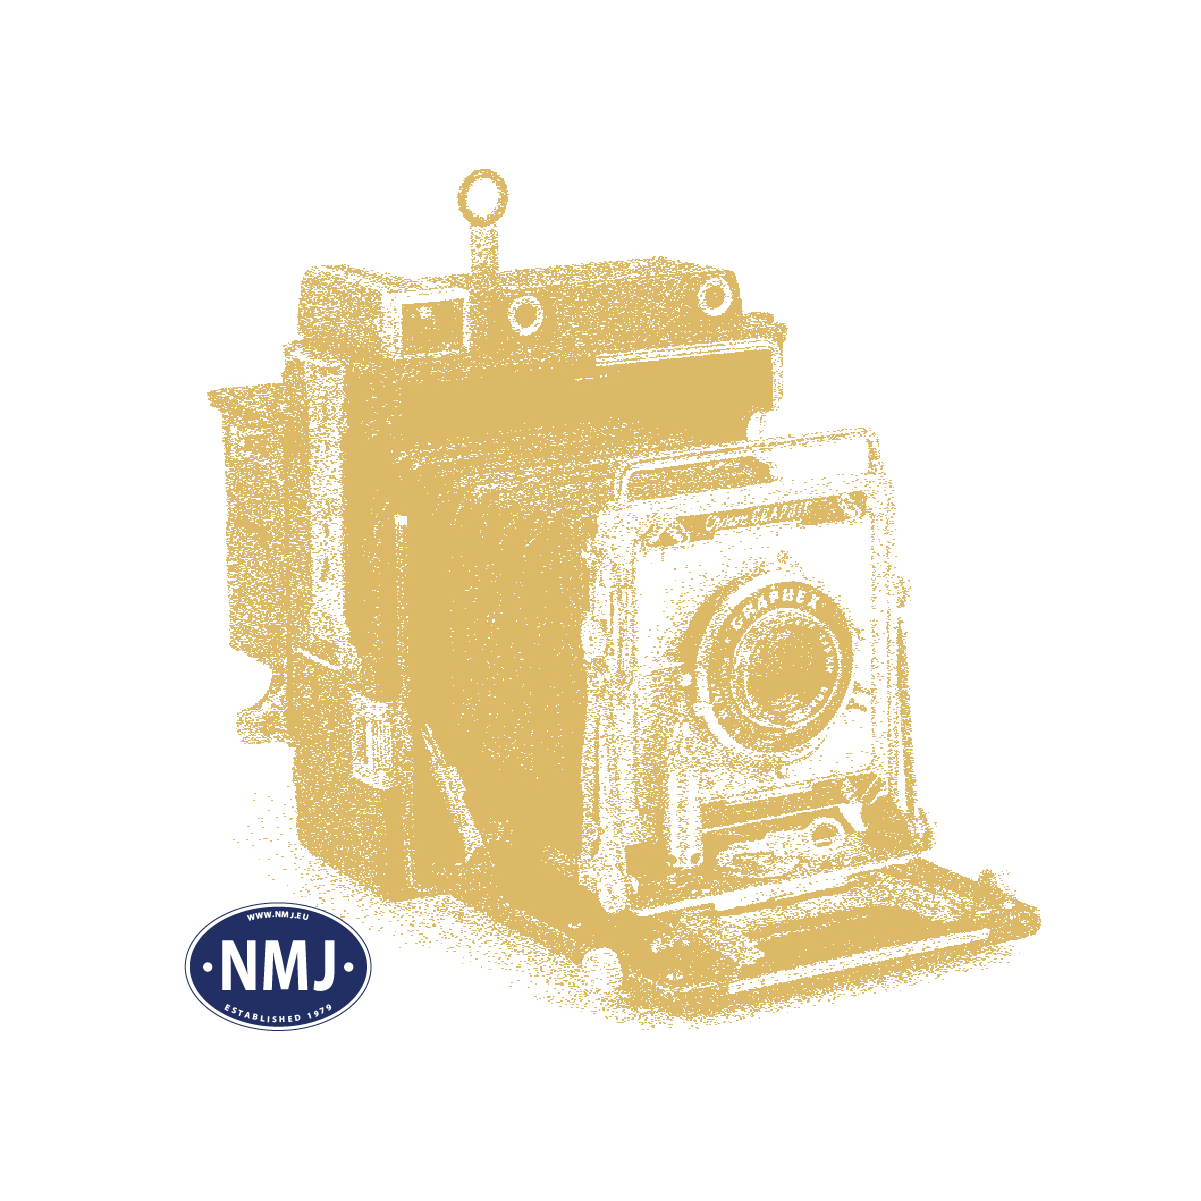 NOC15061 - Skogsarbeidere